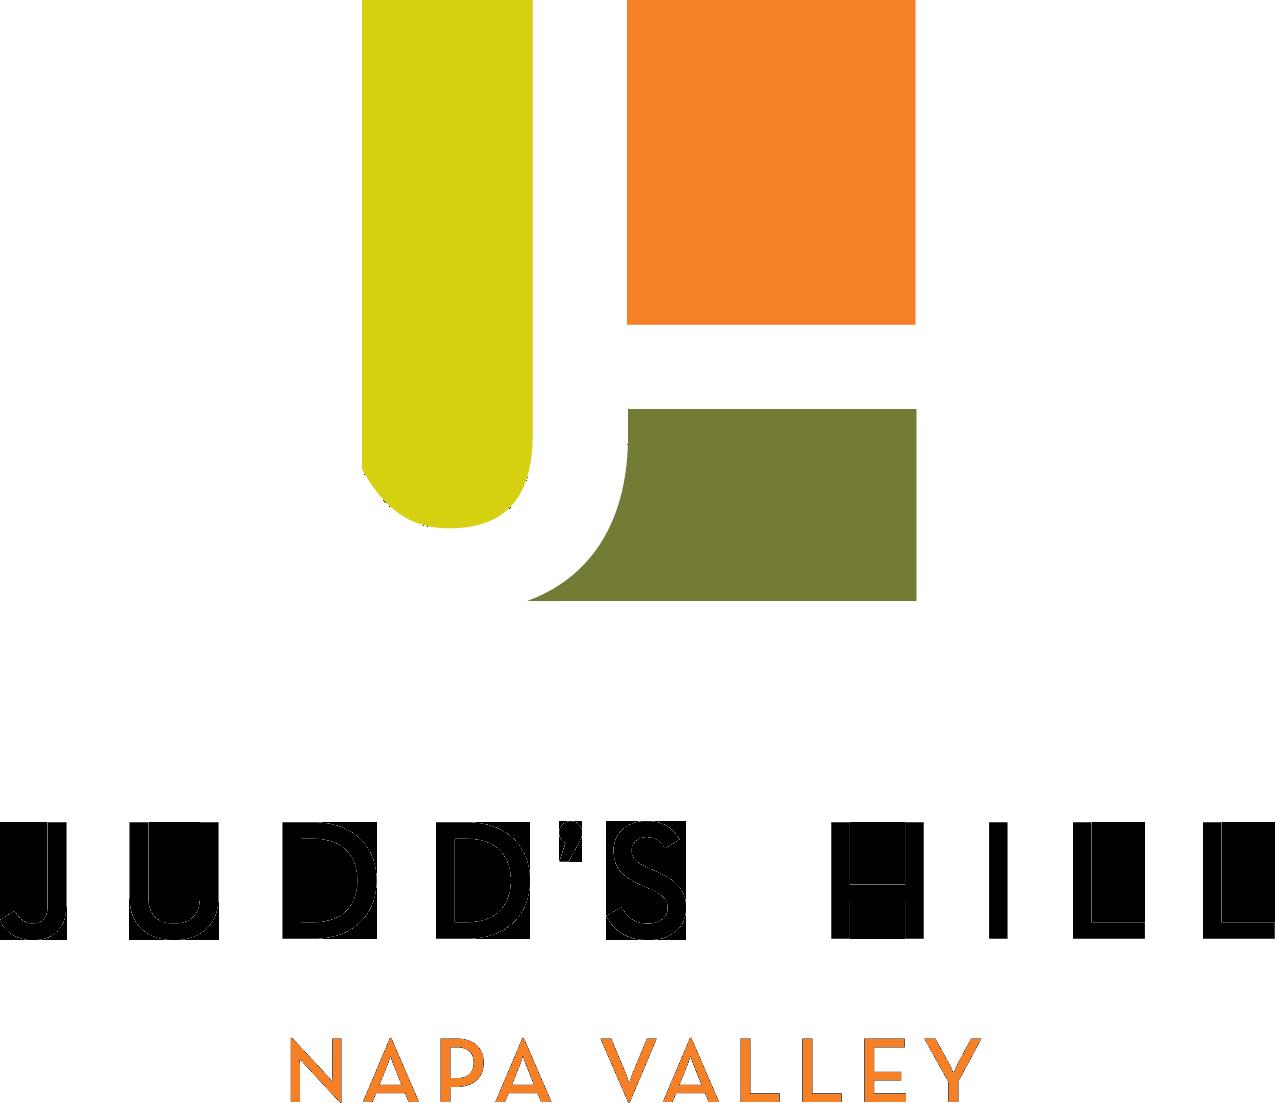 judds hill logo NB.png